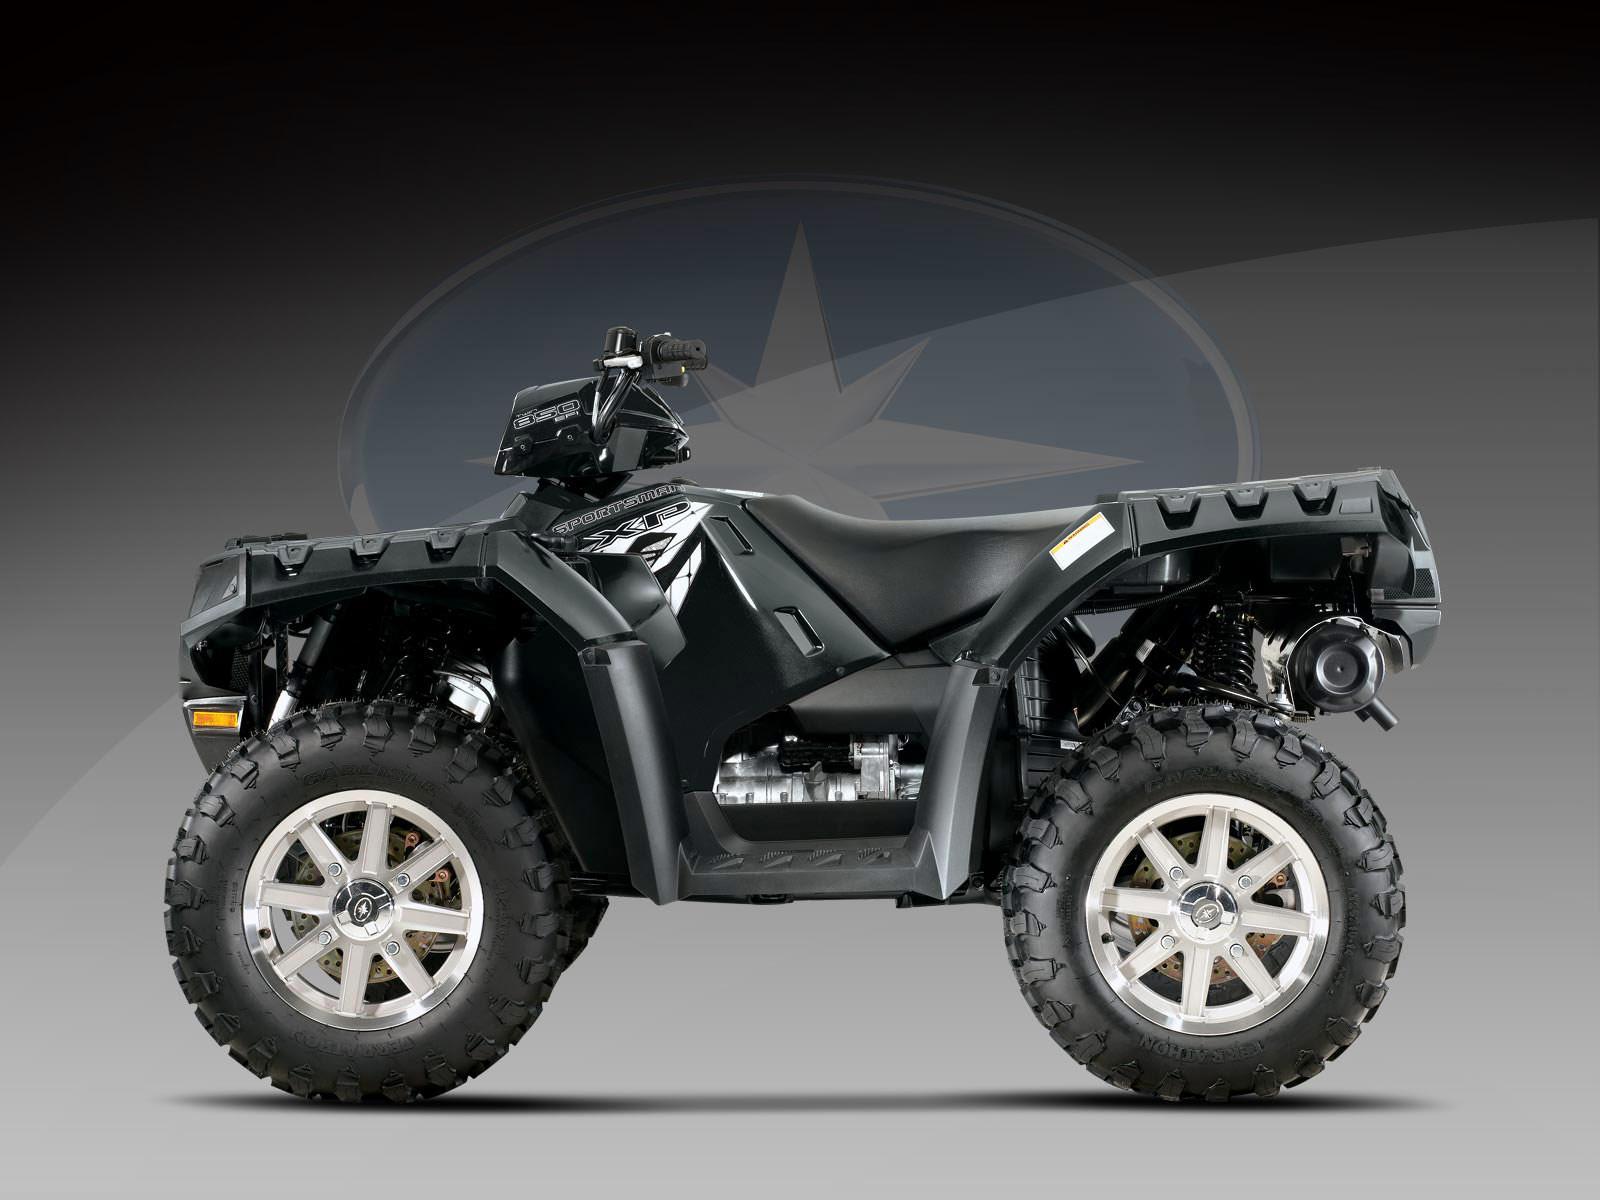 Polaris sportsman 6x6 big boss atvs for sale quad hunter for Where is the nearest yamaha dealer